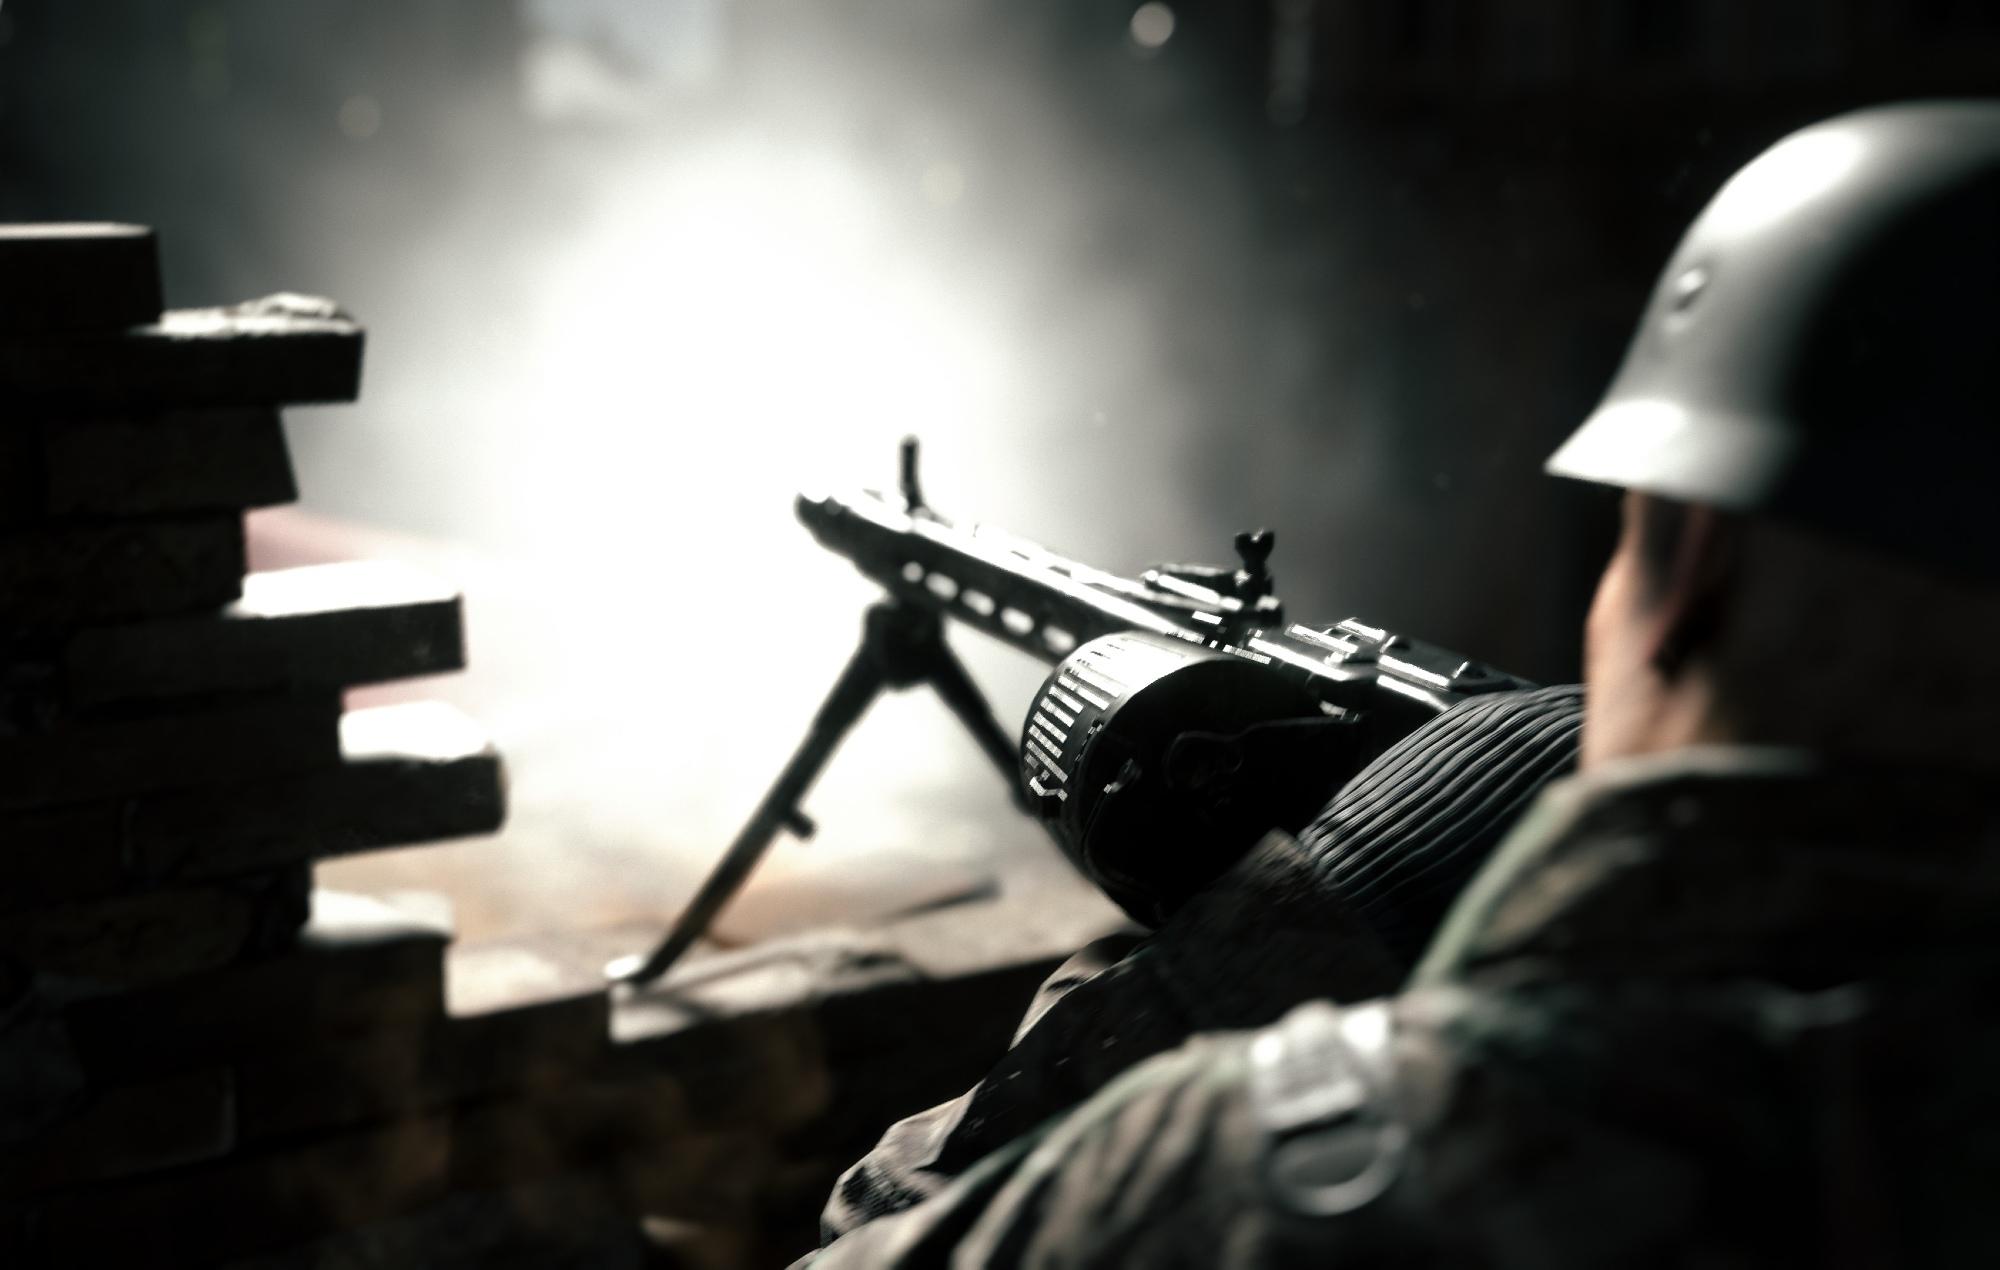 Hell let loose machine gun